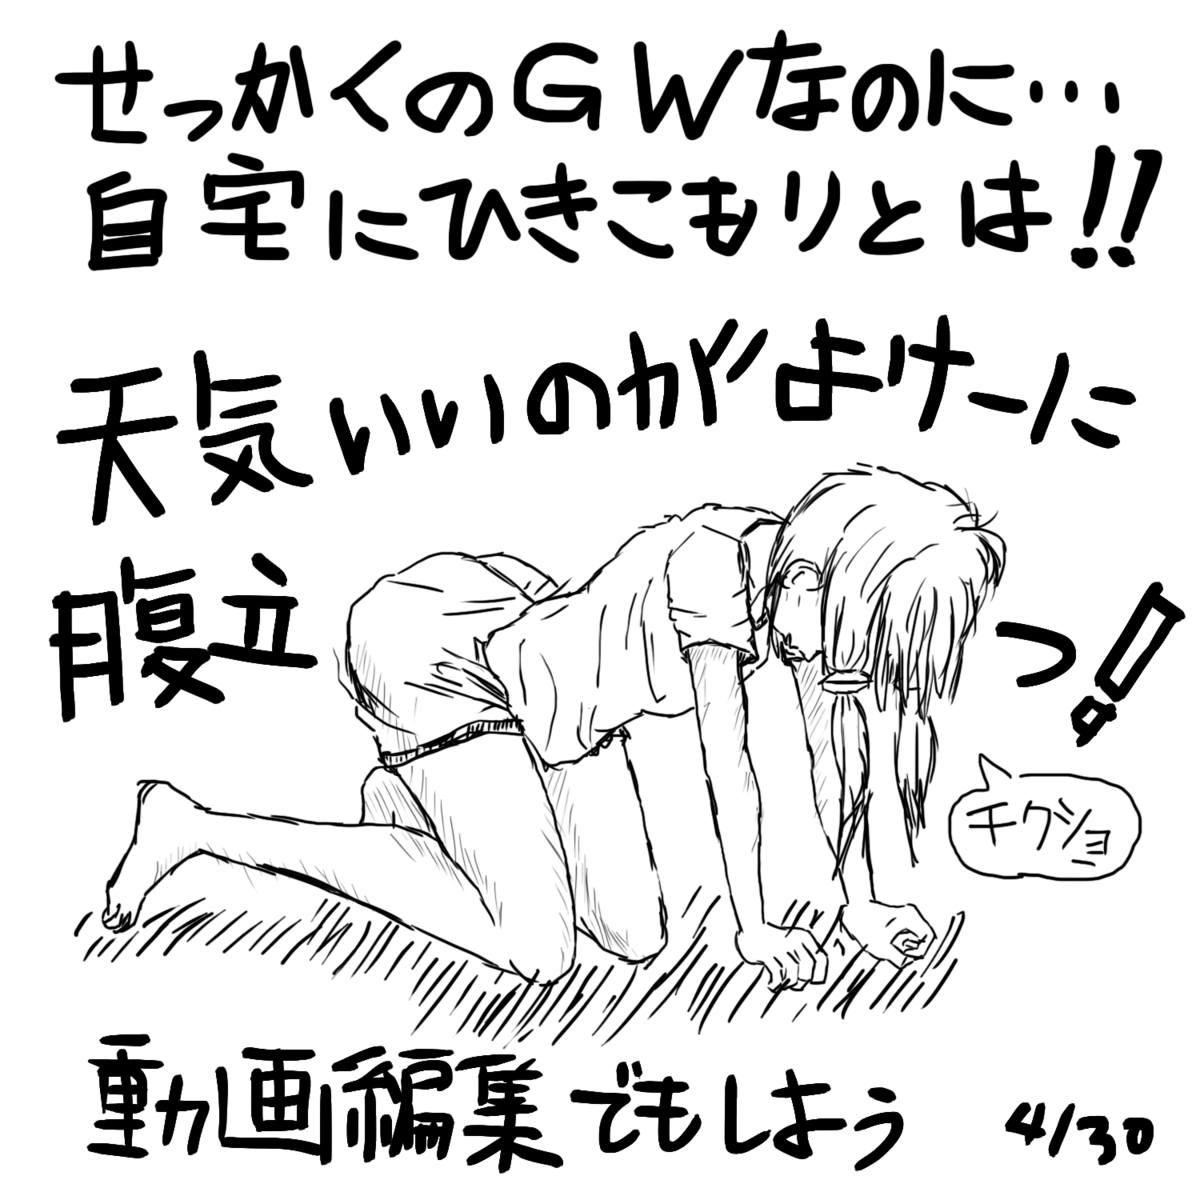 f:id:zomuzomu:20200430113416p:plain